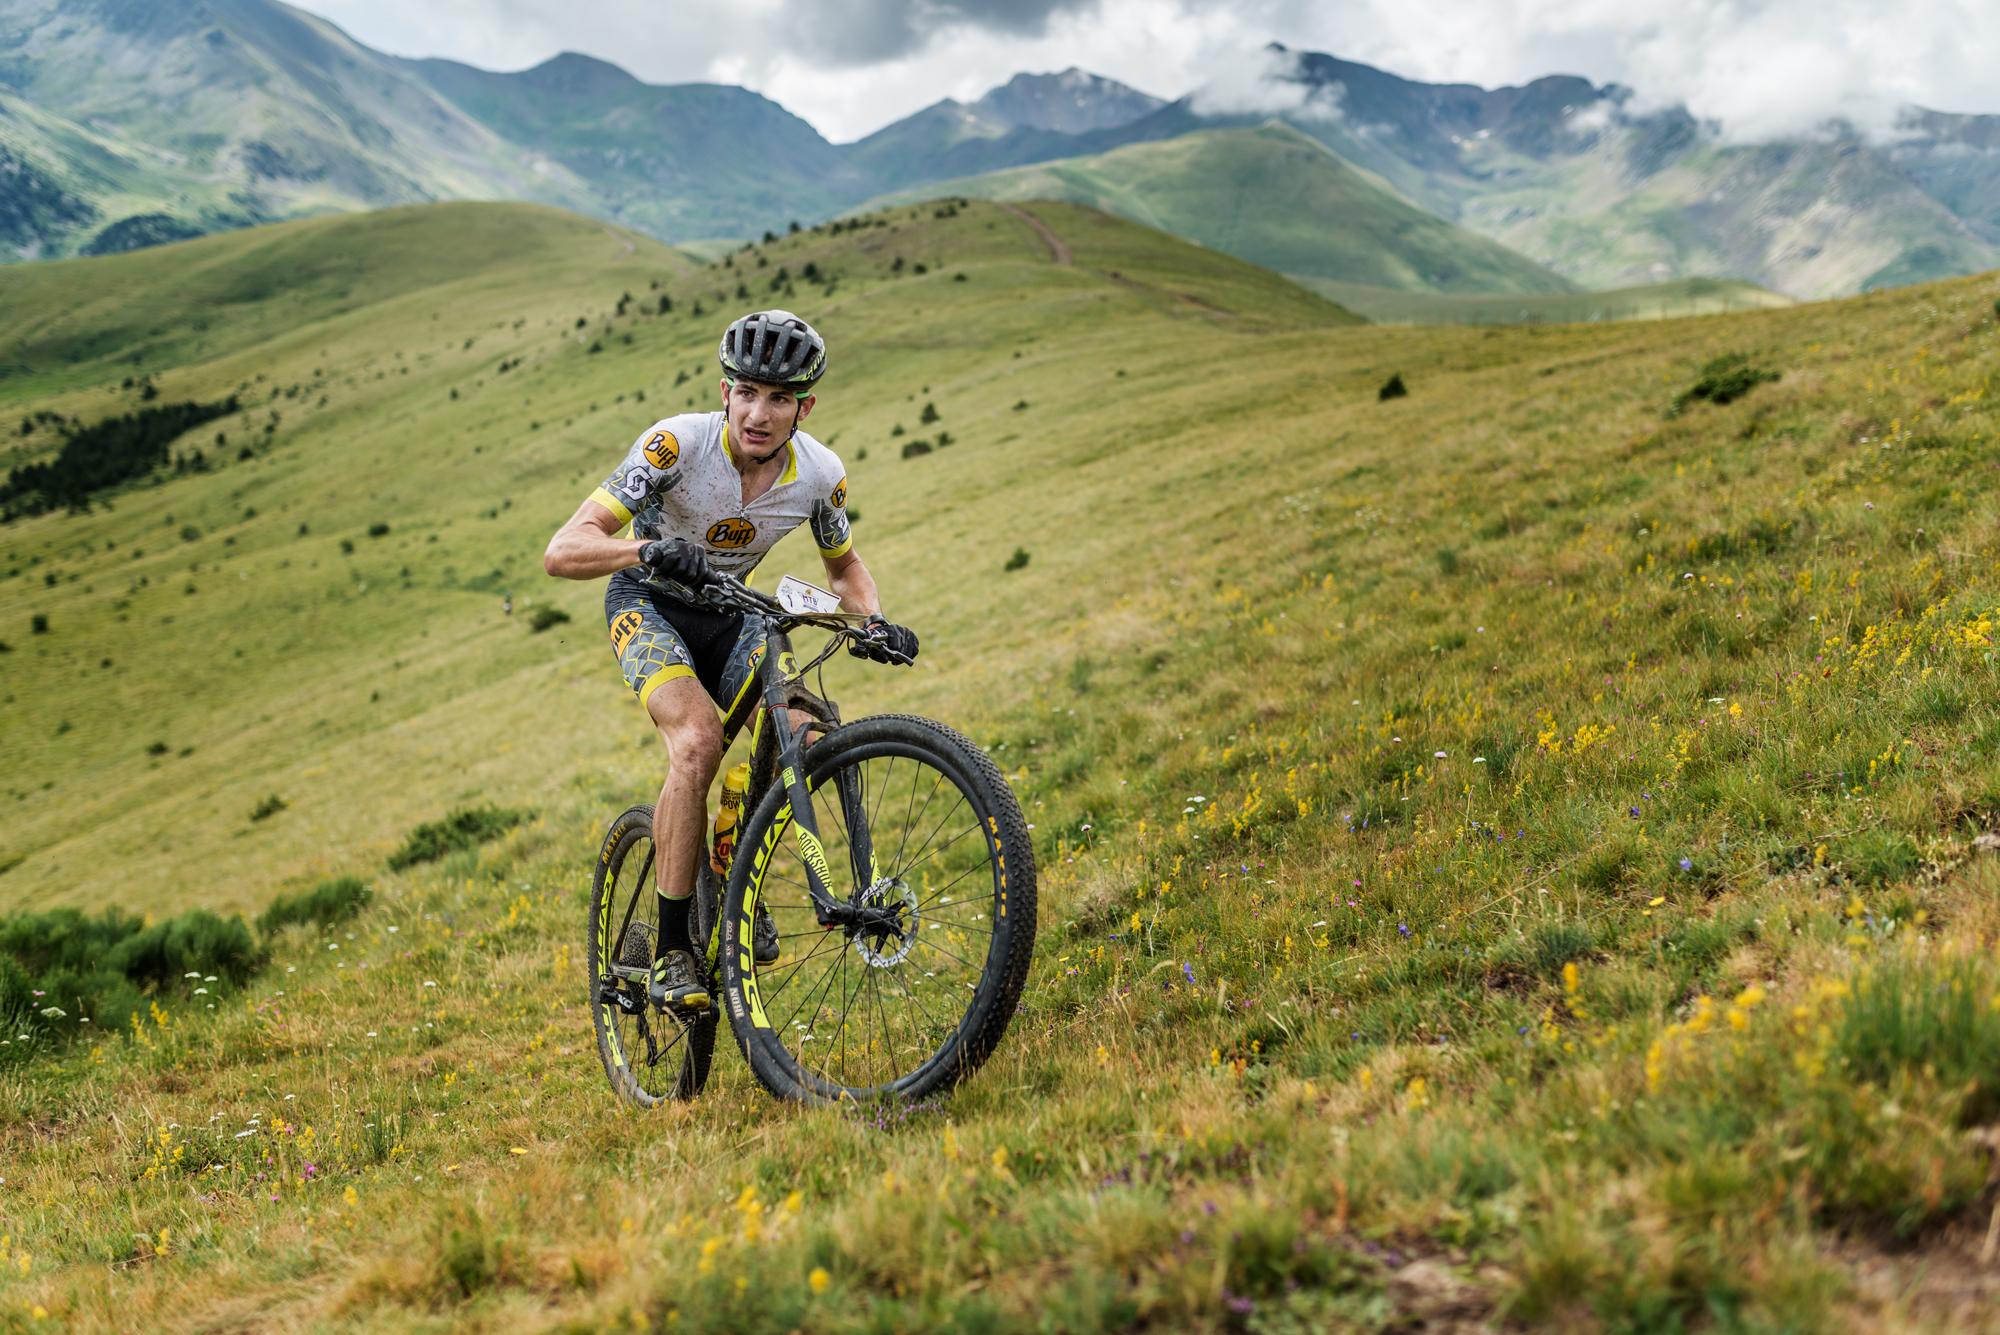 Descubre el mountain bike de alta monta�a en la Marathon Cup by Scott & Taymory de Vall de Bo�